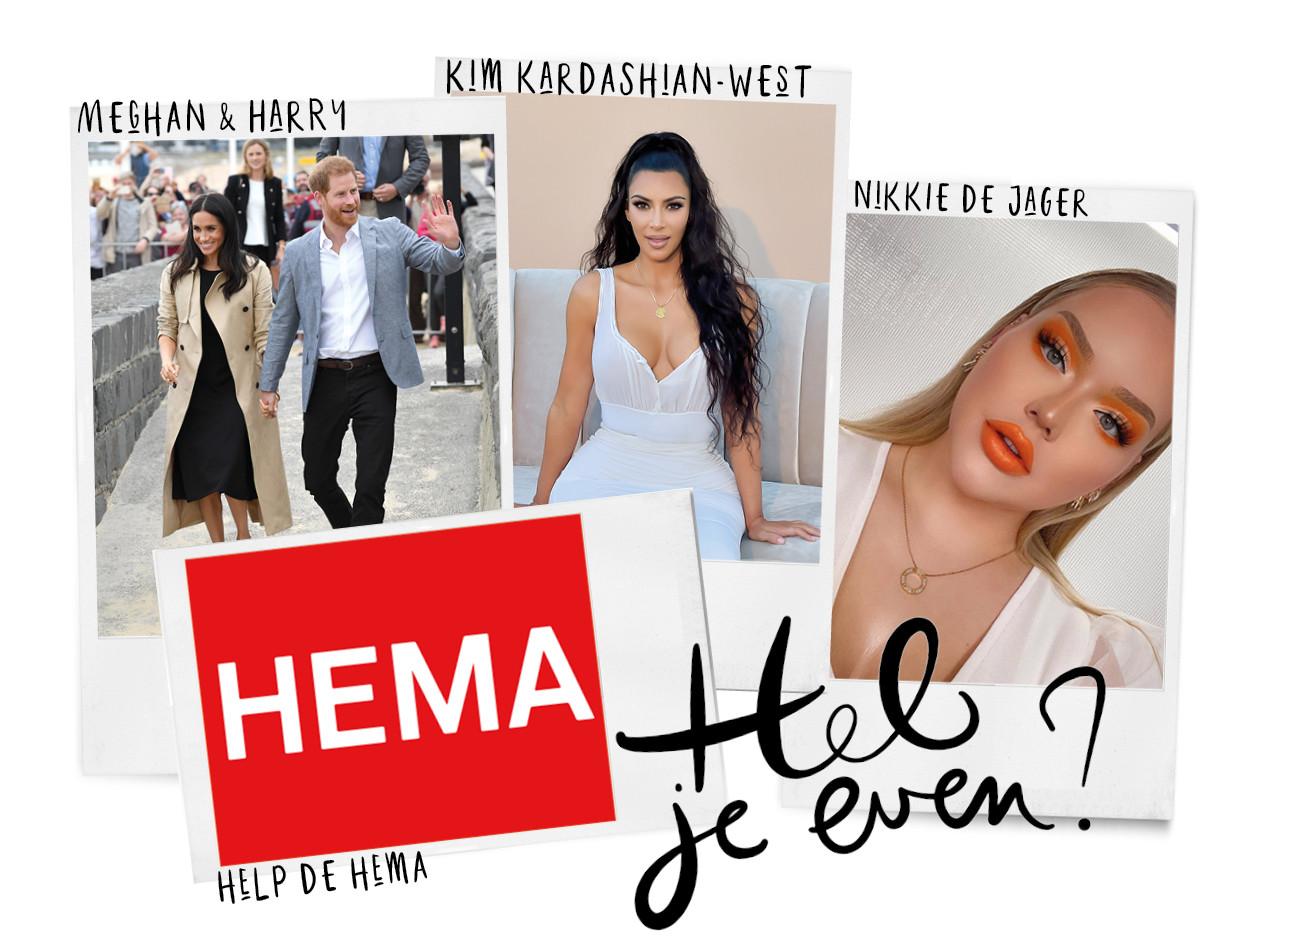 Hema, kim kardashian west, nikki de jager, meghan markle